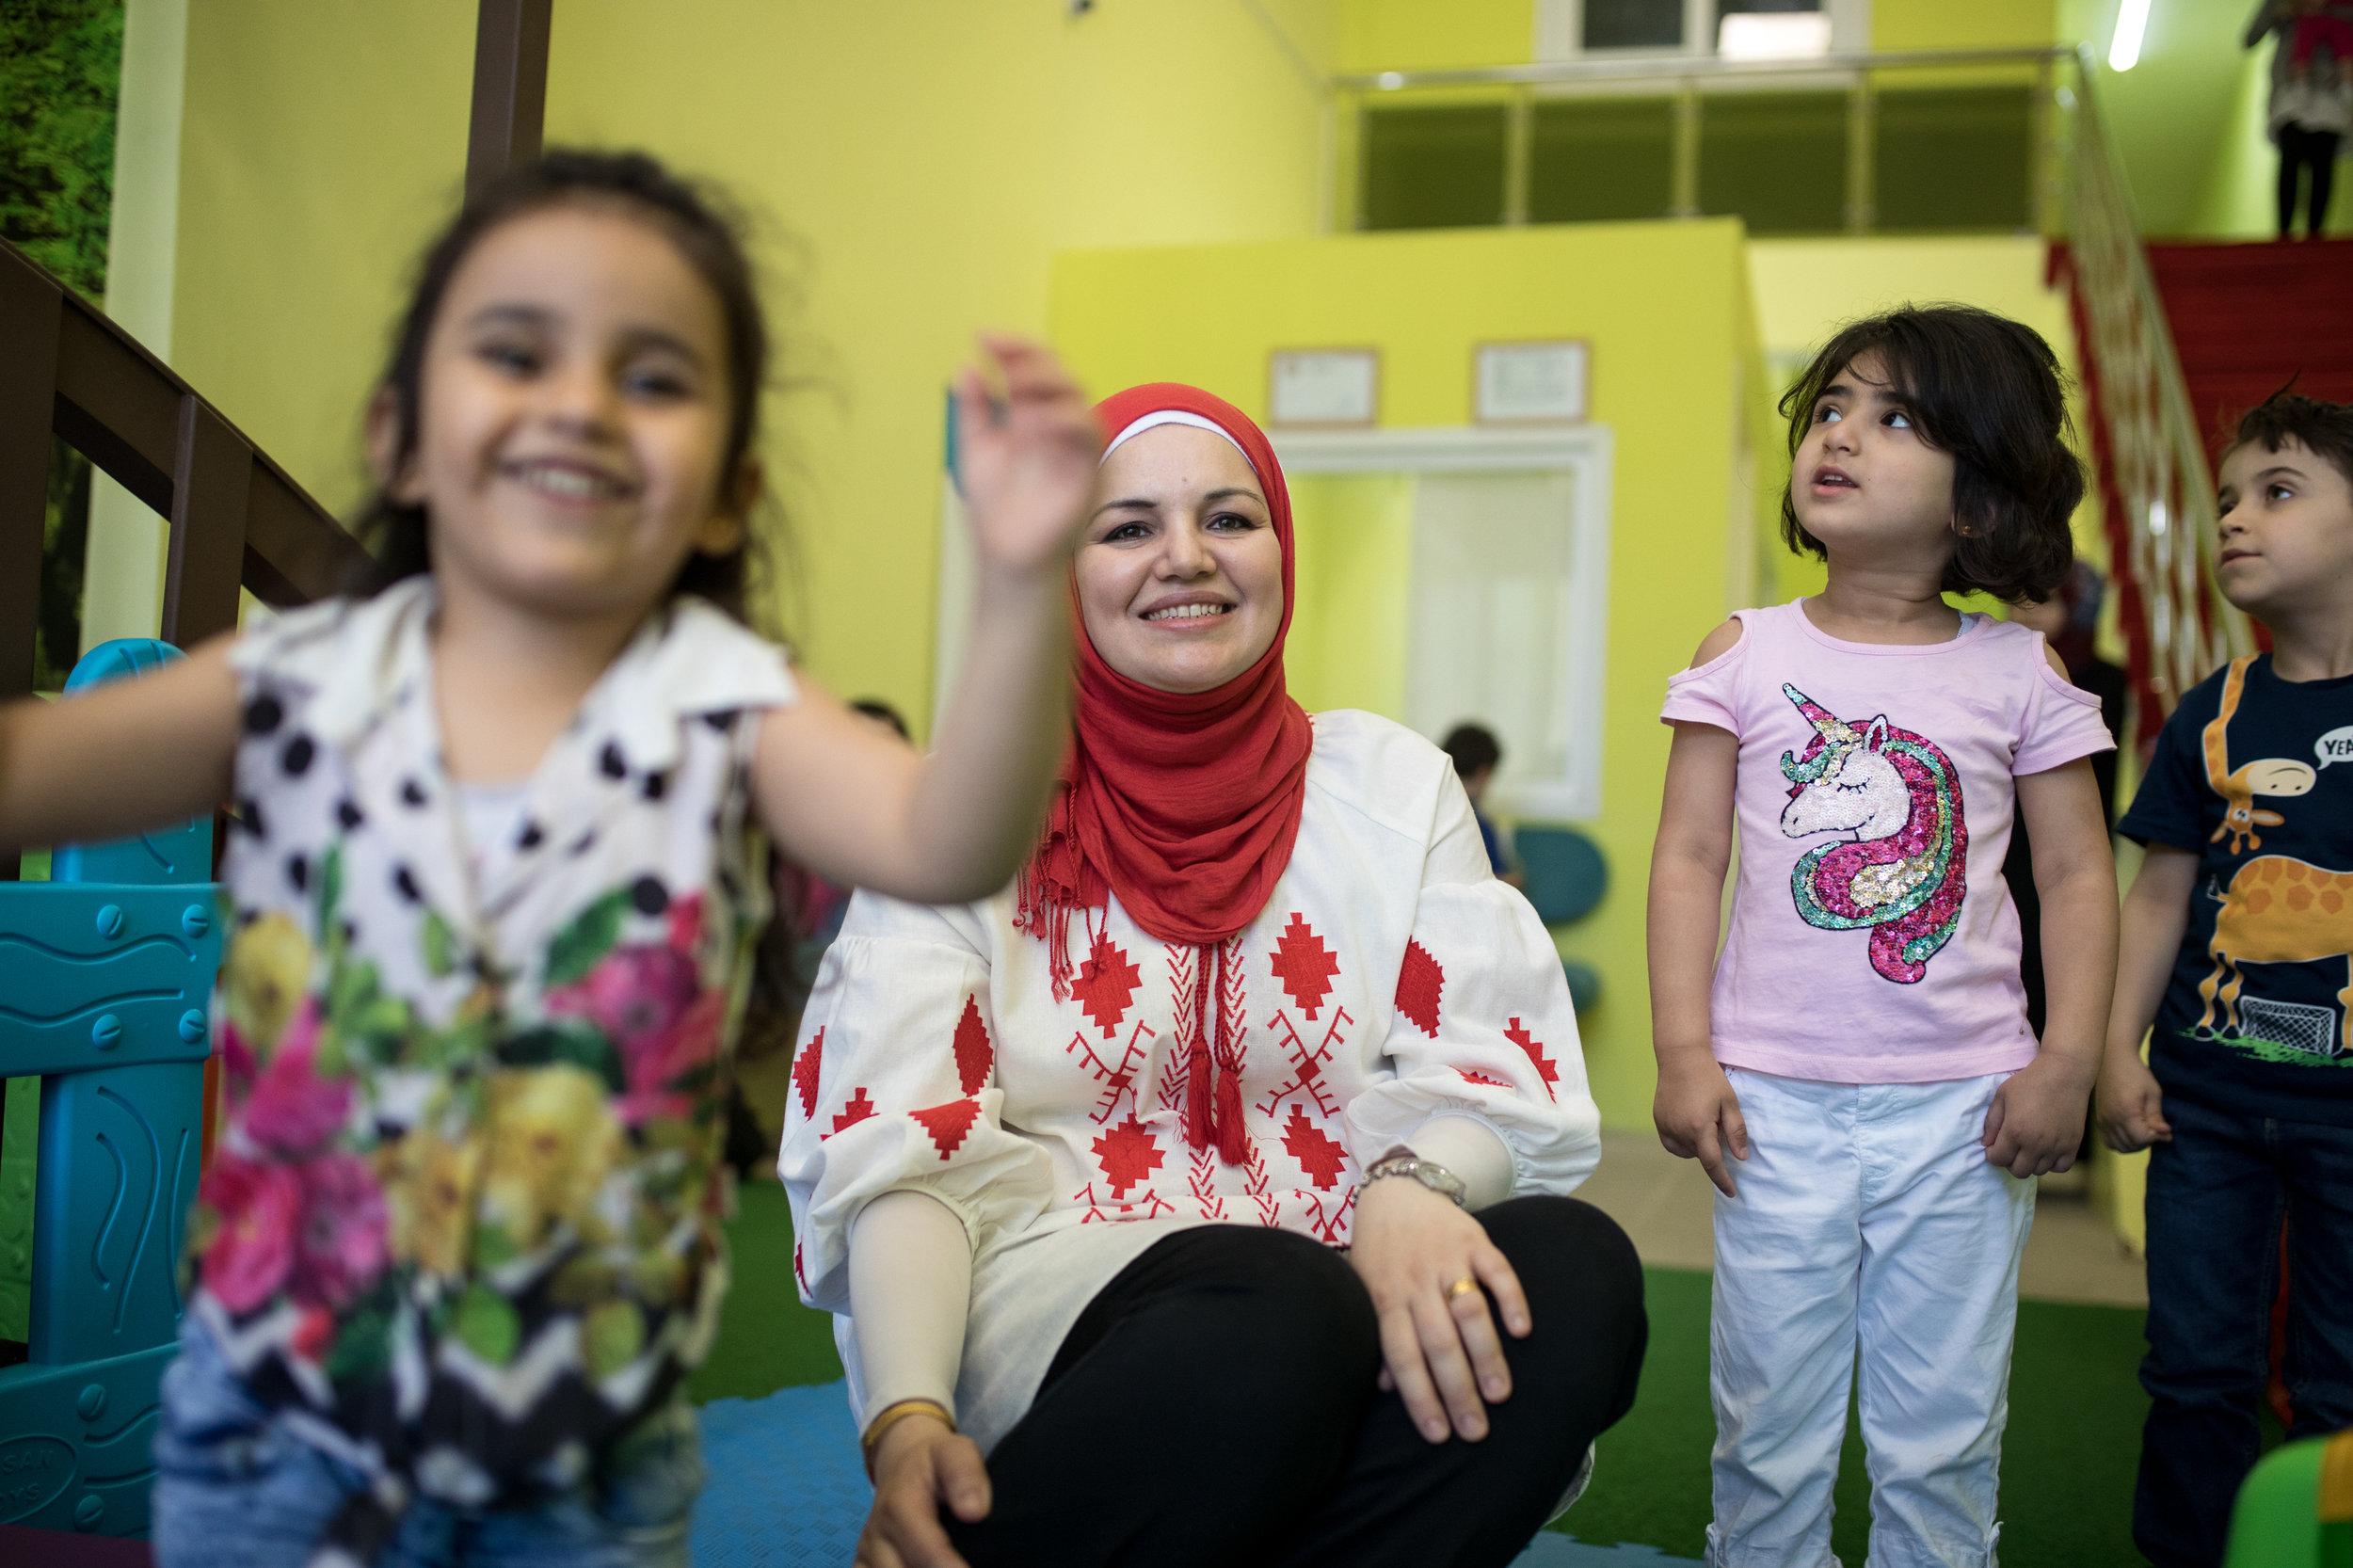 2018-07-03_Dania Al Bouchi, 30, Dunya Al Khayal Kindergarten, Gaziantep, TK_0241.jpg